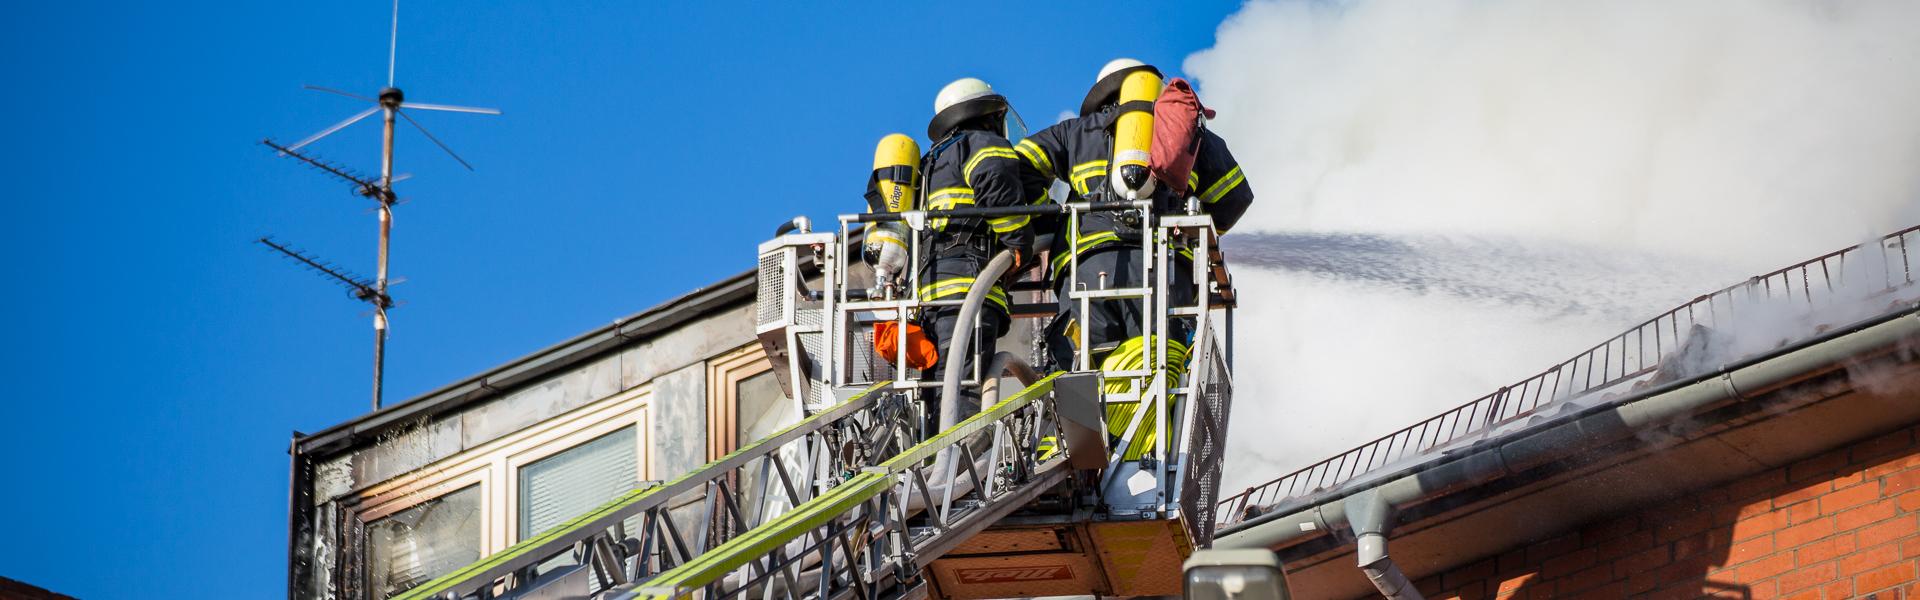 06.05.2020 – Dachstuhlbrand in HH-Horn